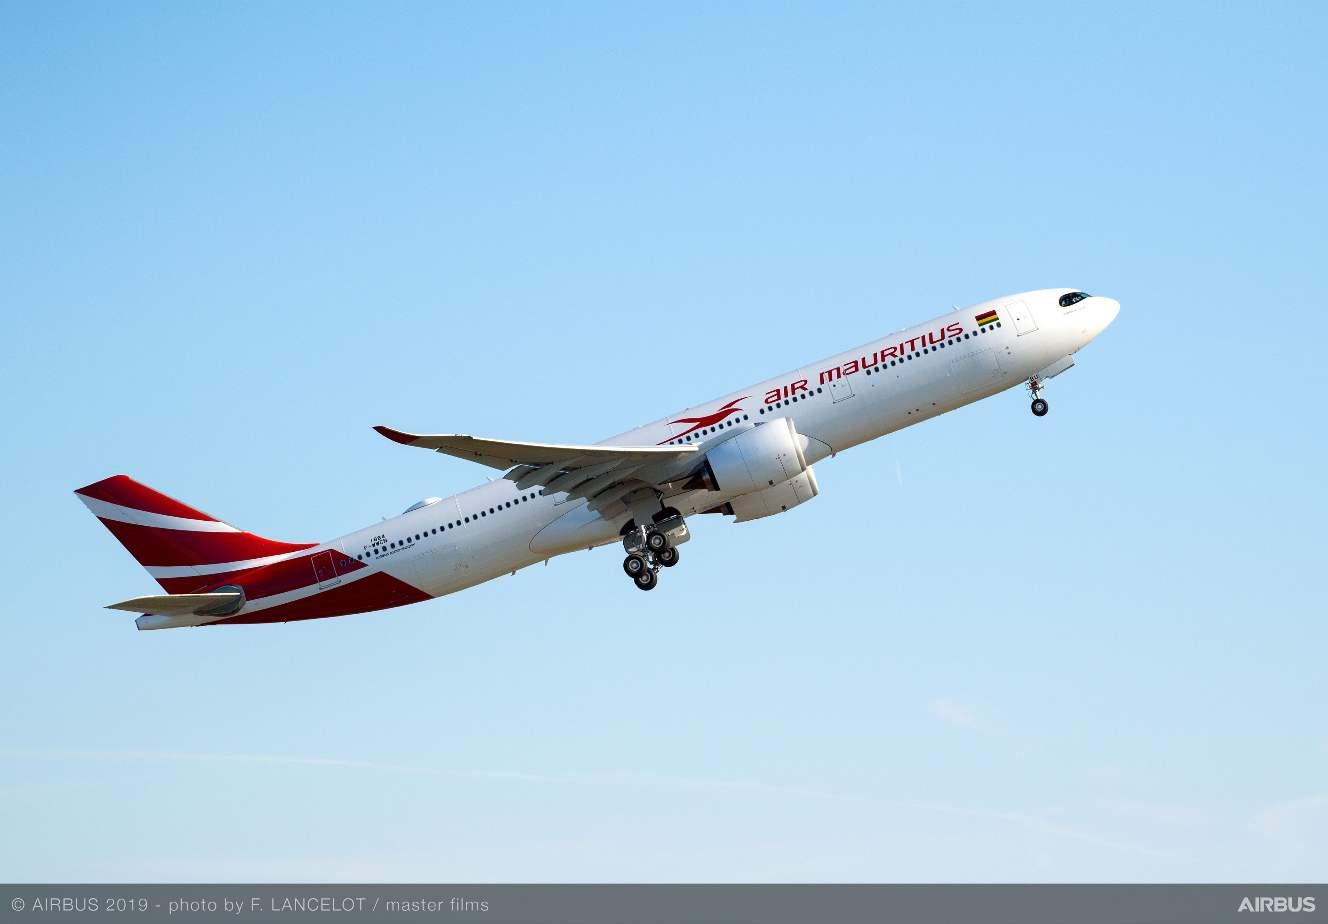 Air Mauritius gets first Airbus A330neo